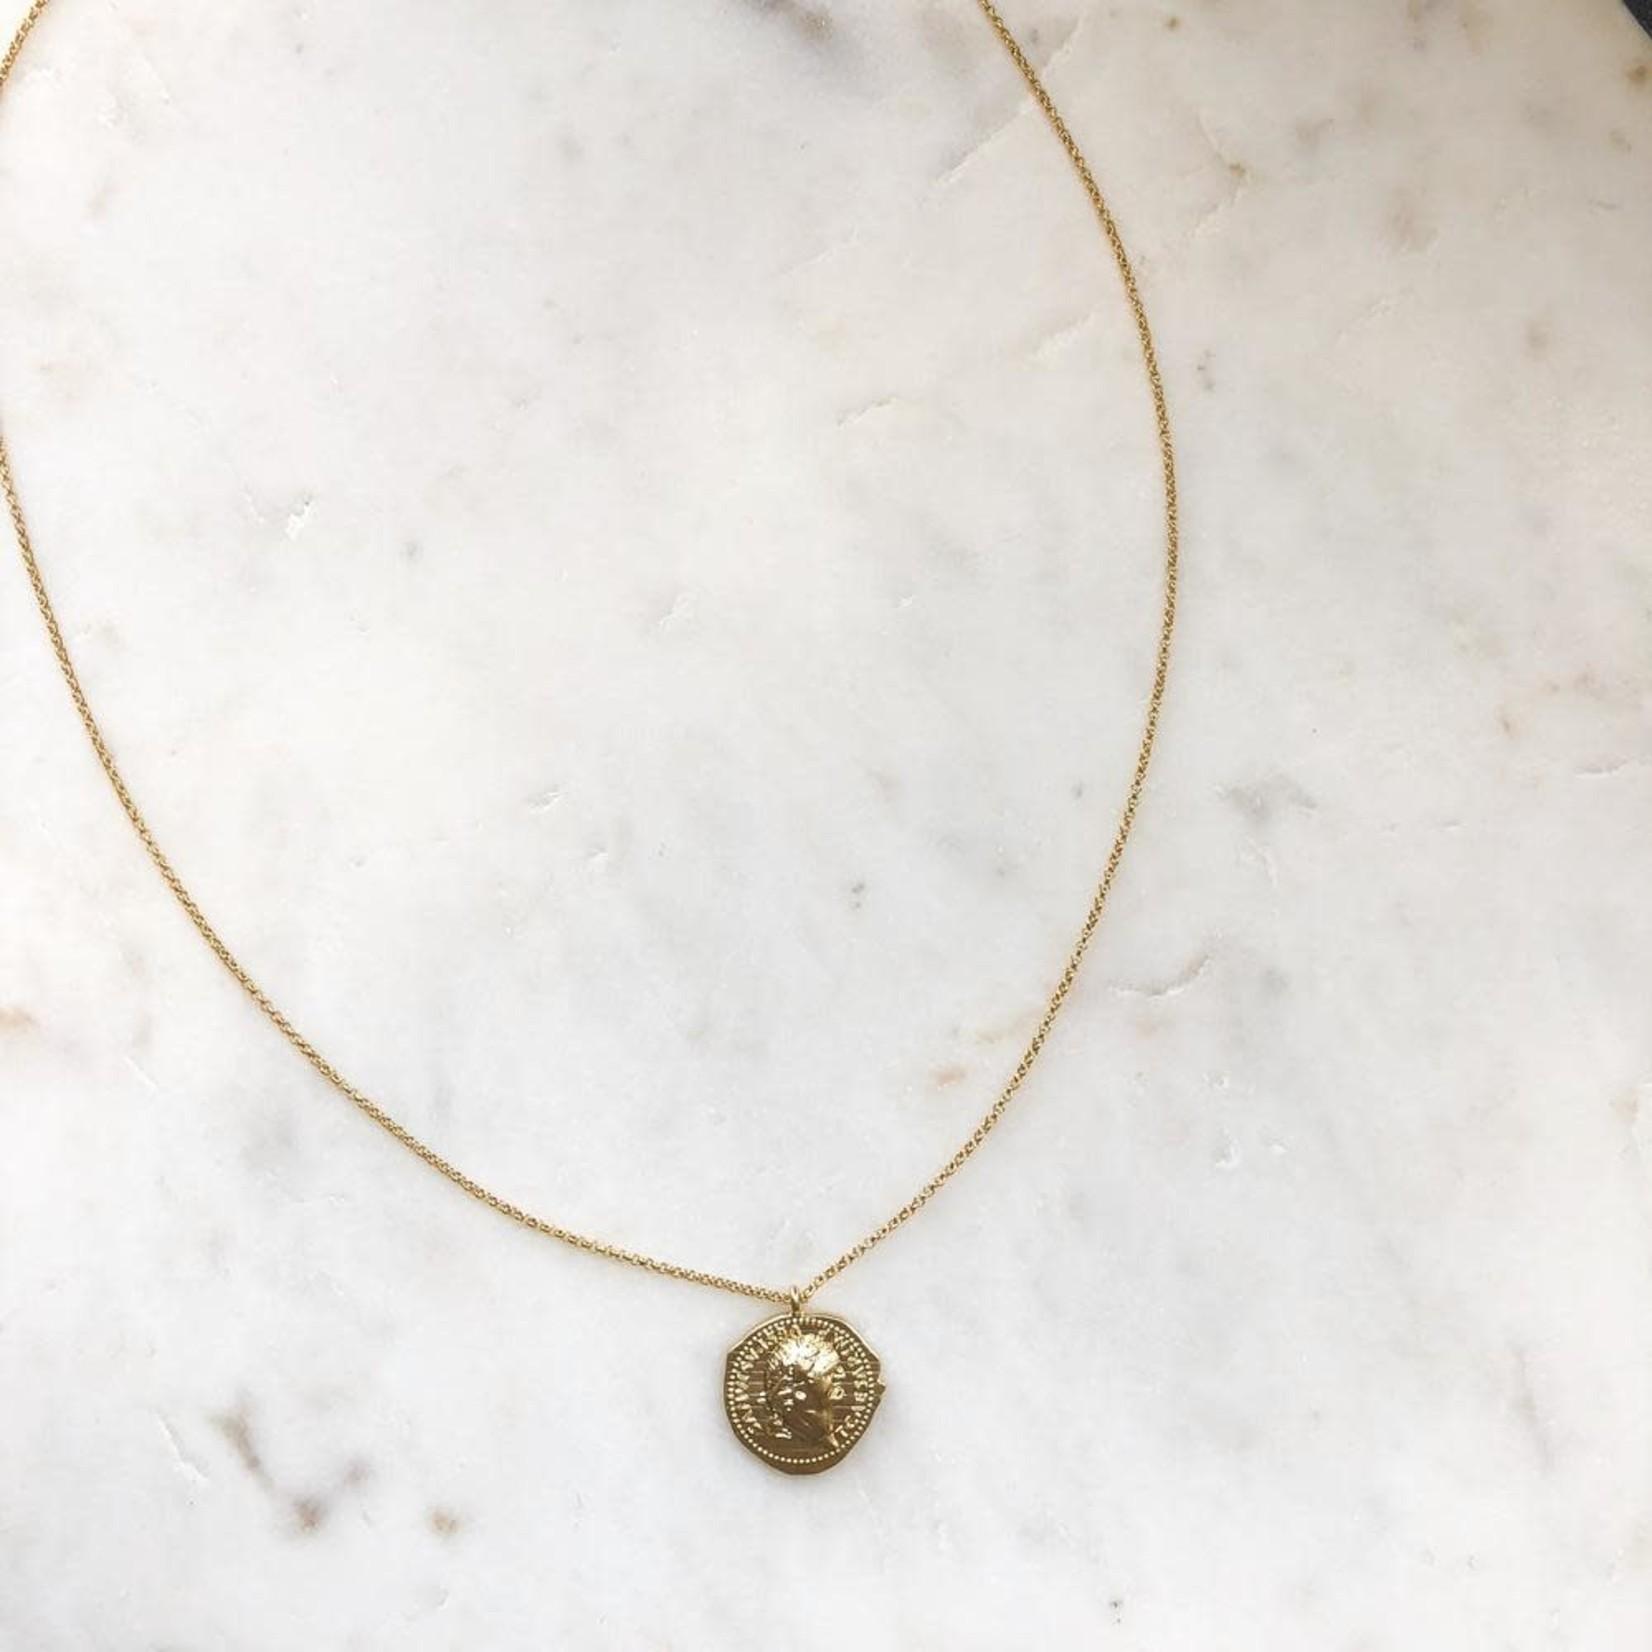 Horace Jewelry Horace collier LIARD